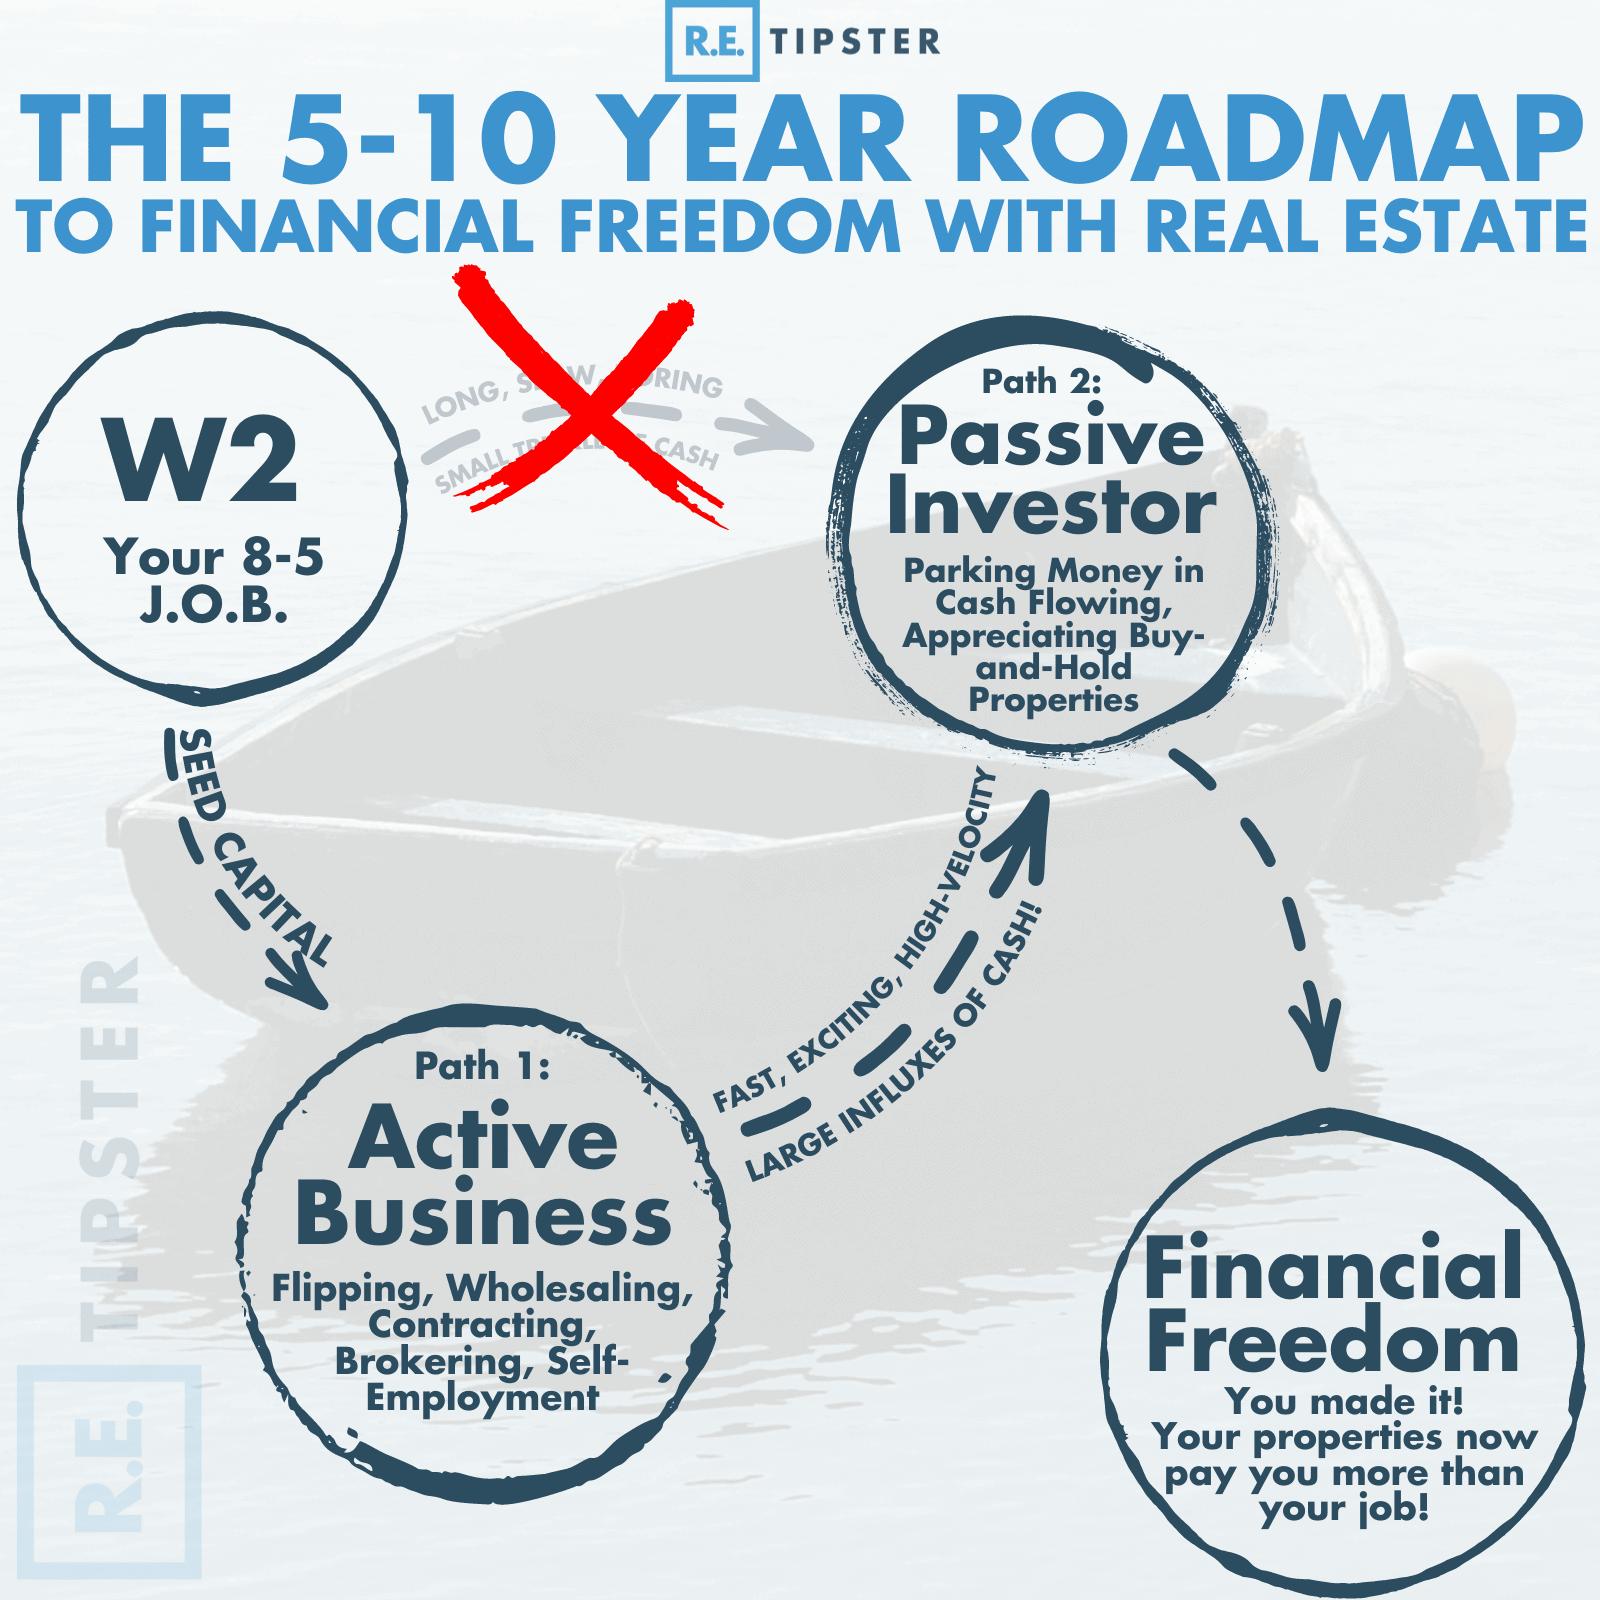 5-10 year roadmap